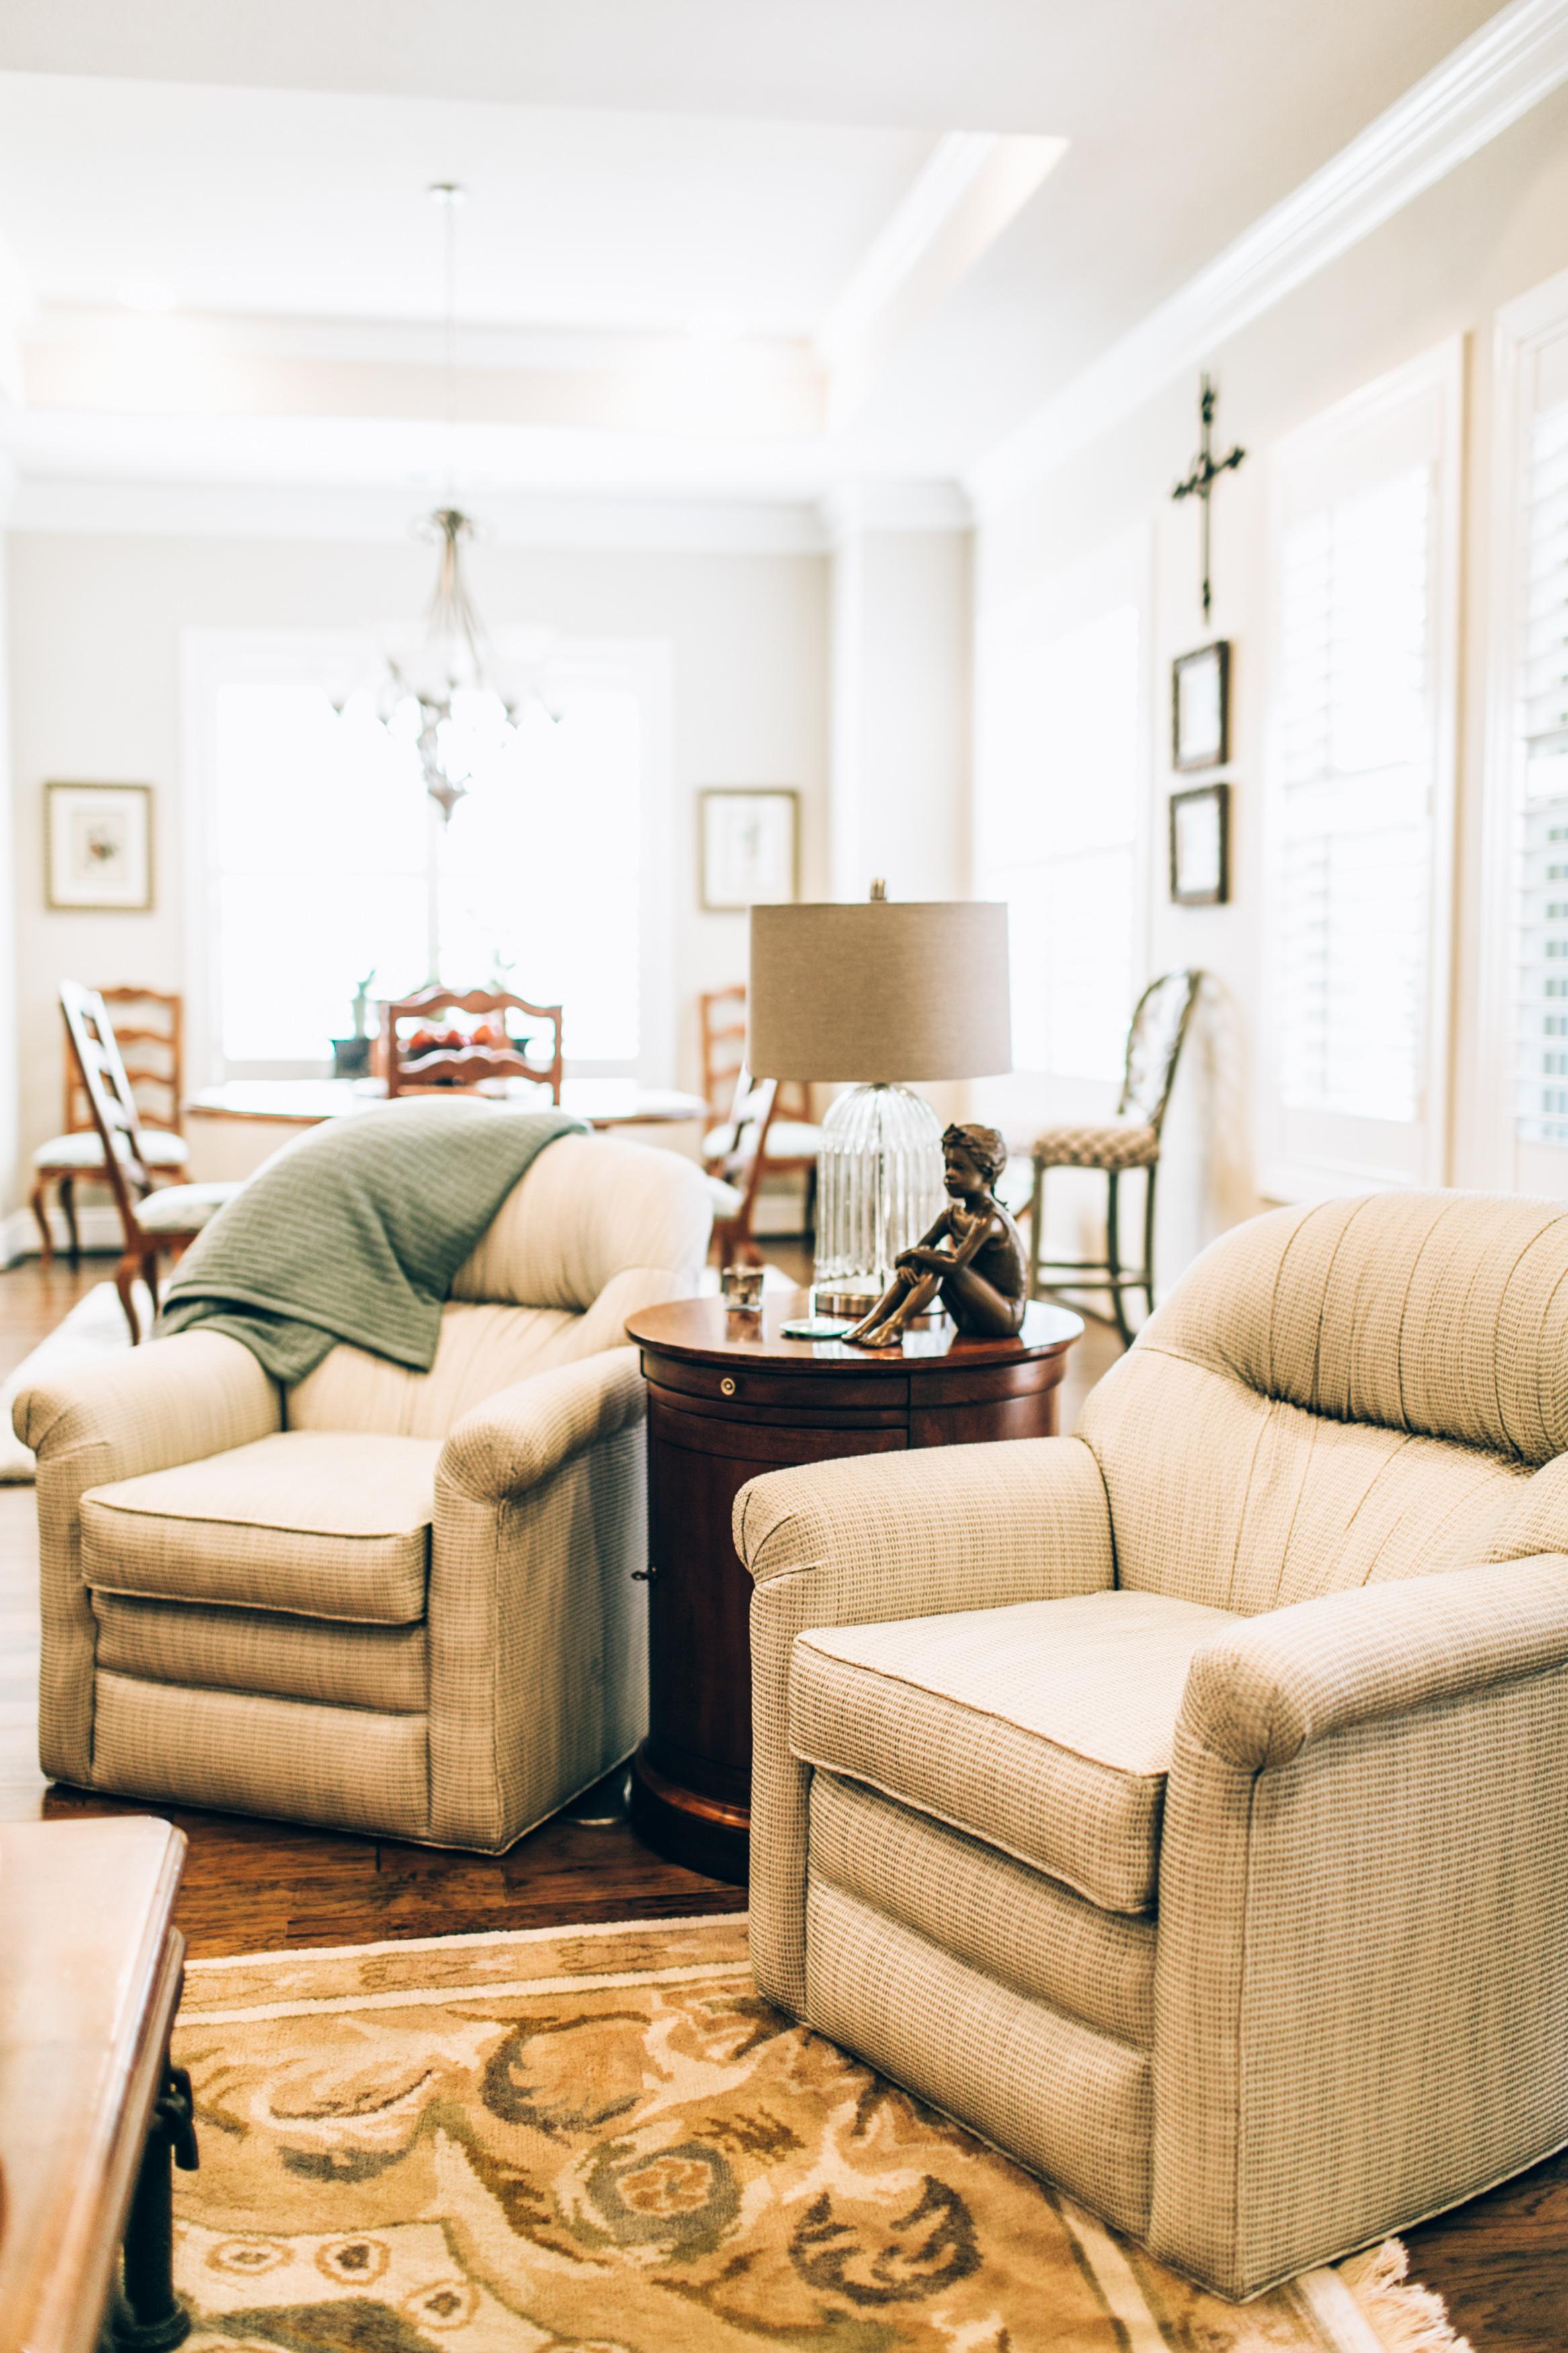 interior-design-home-decorating-340.jpg